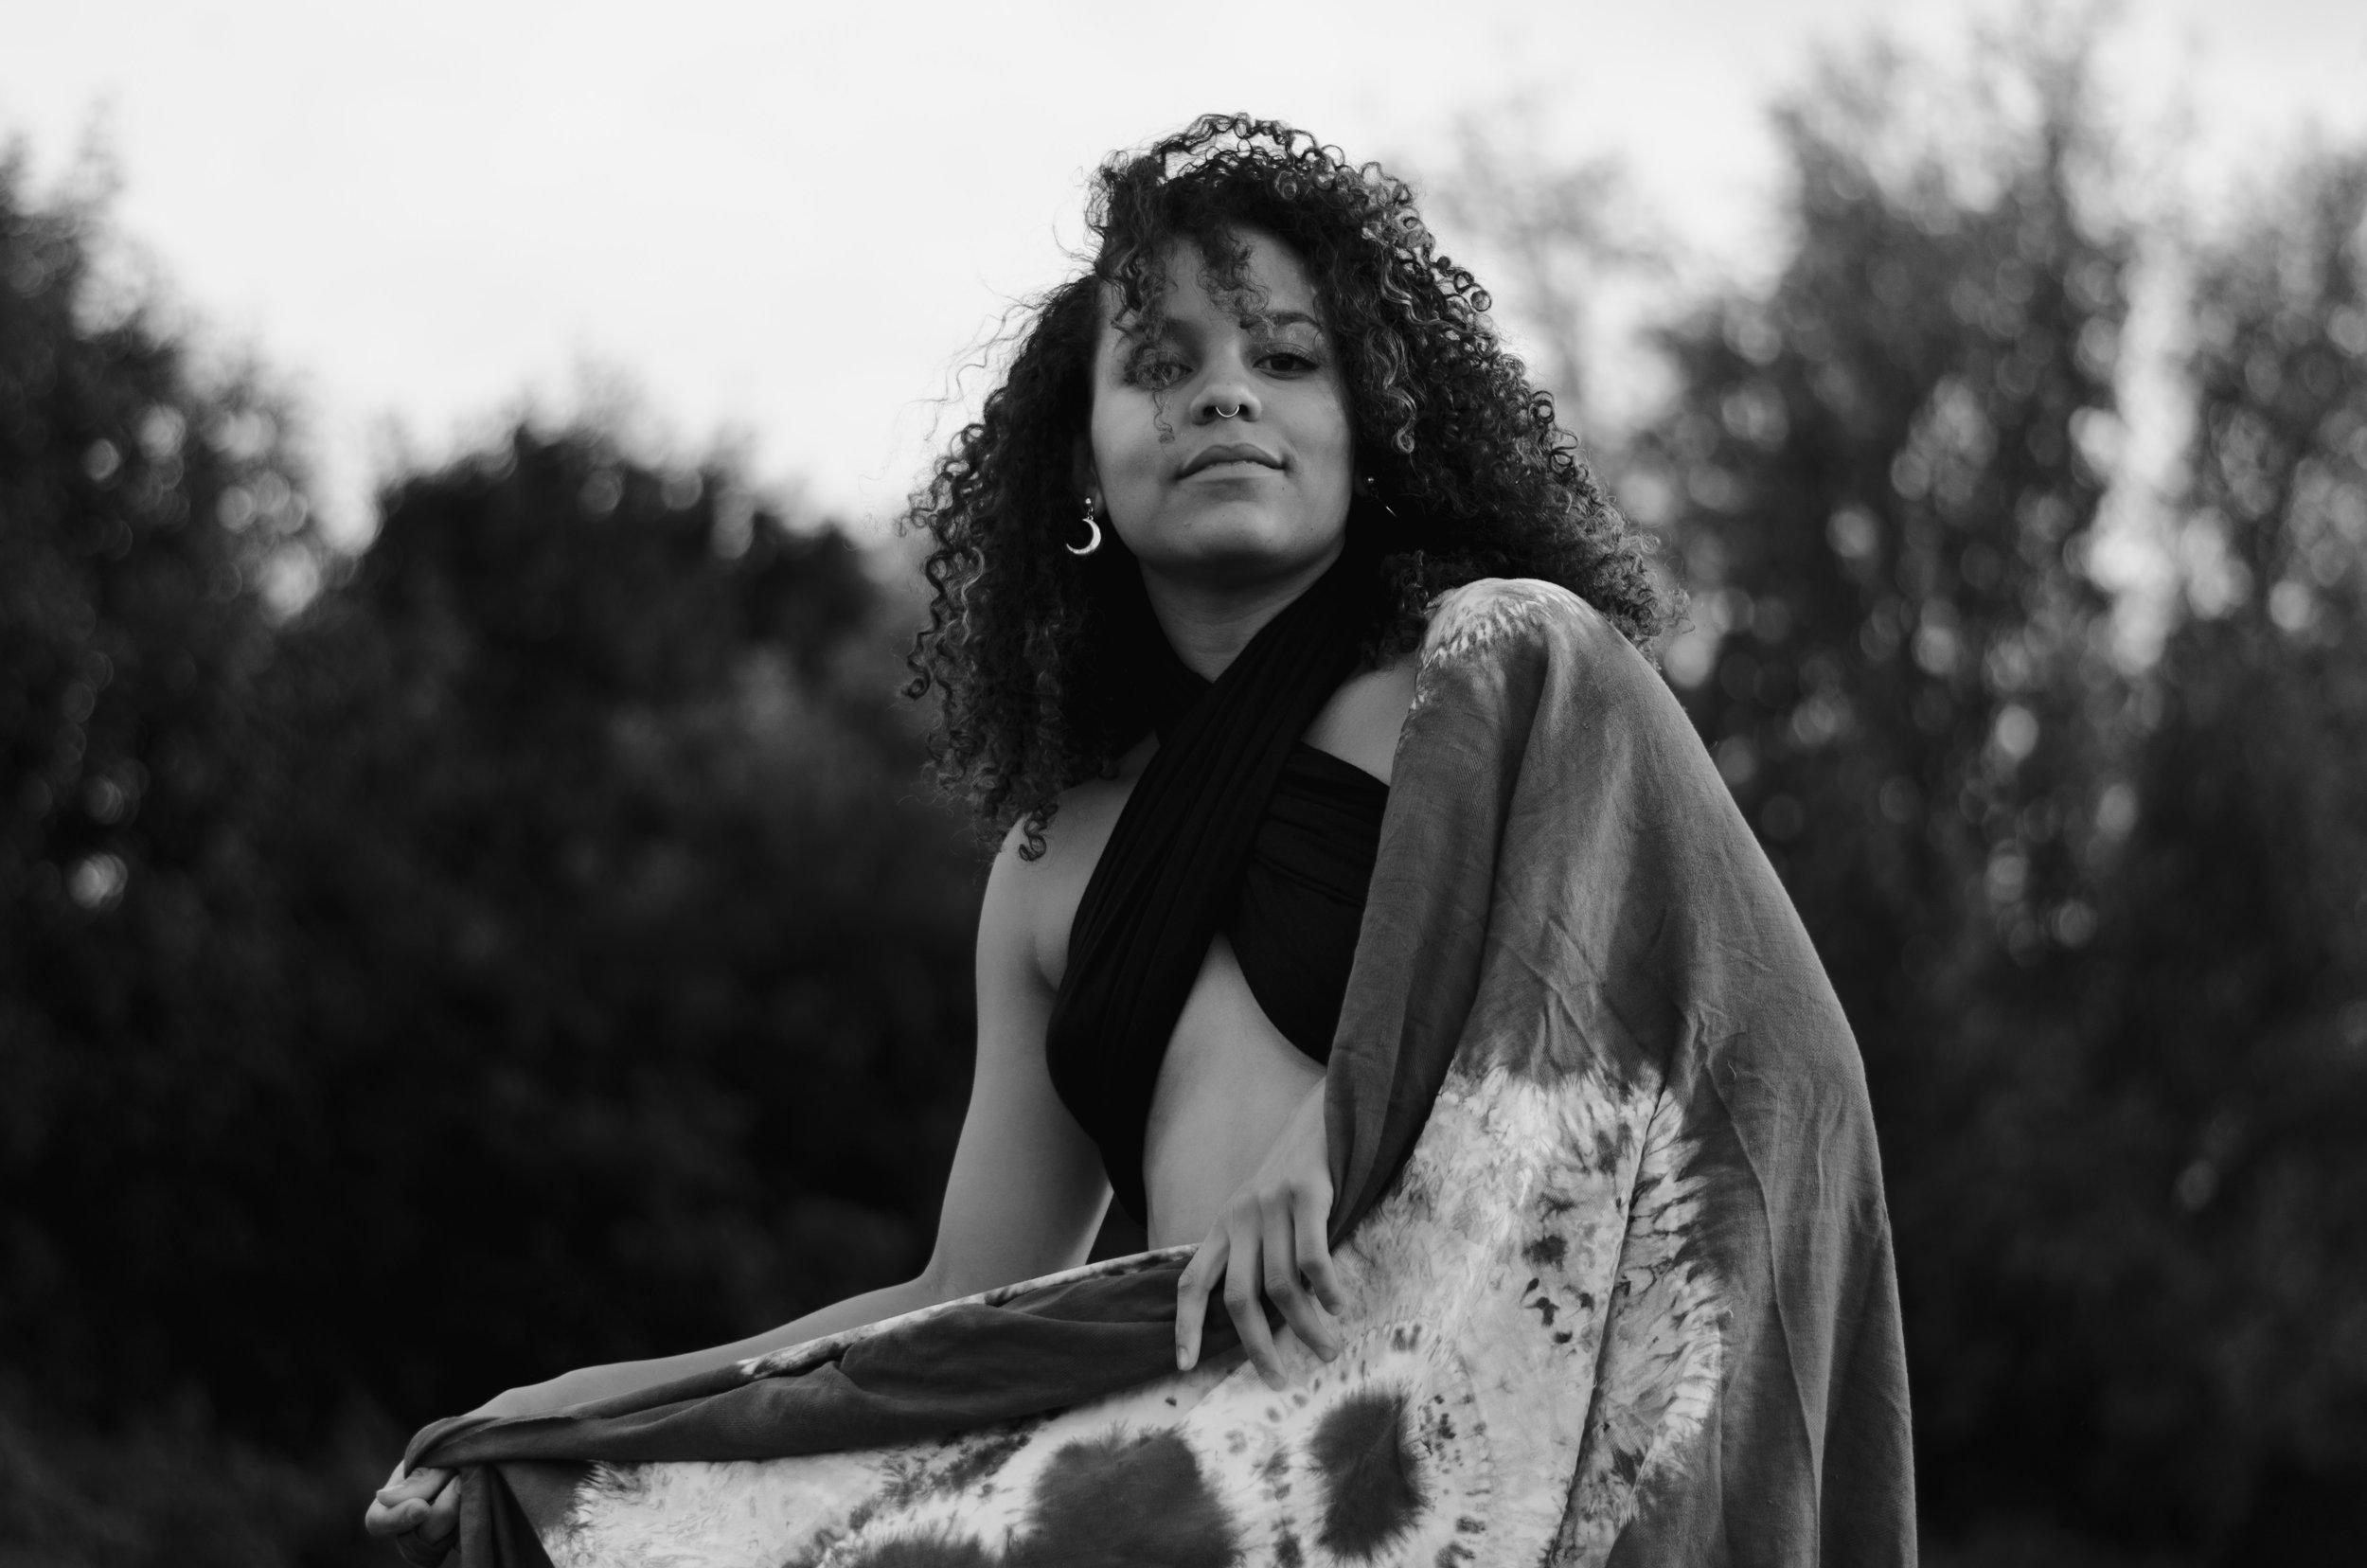 Inka_Portrait_Session_Aiste_Saulyte_Photography_4.JPG